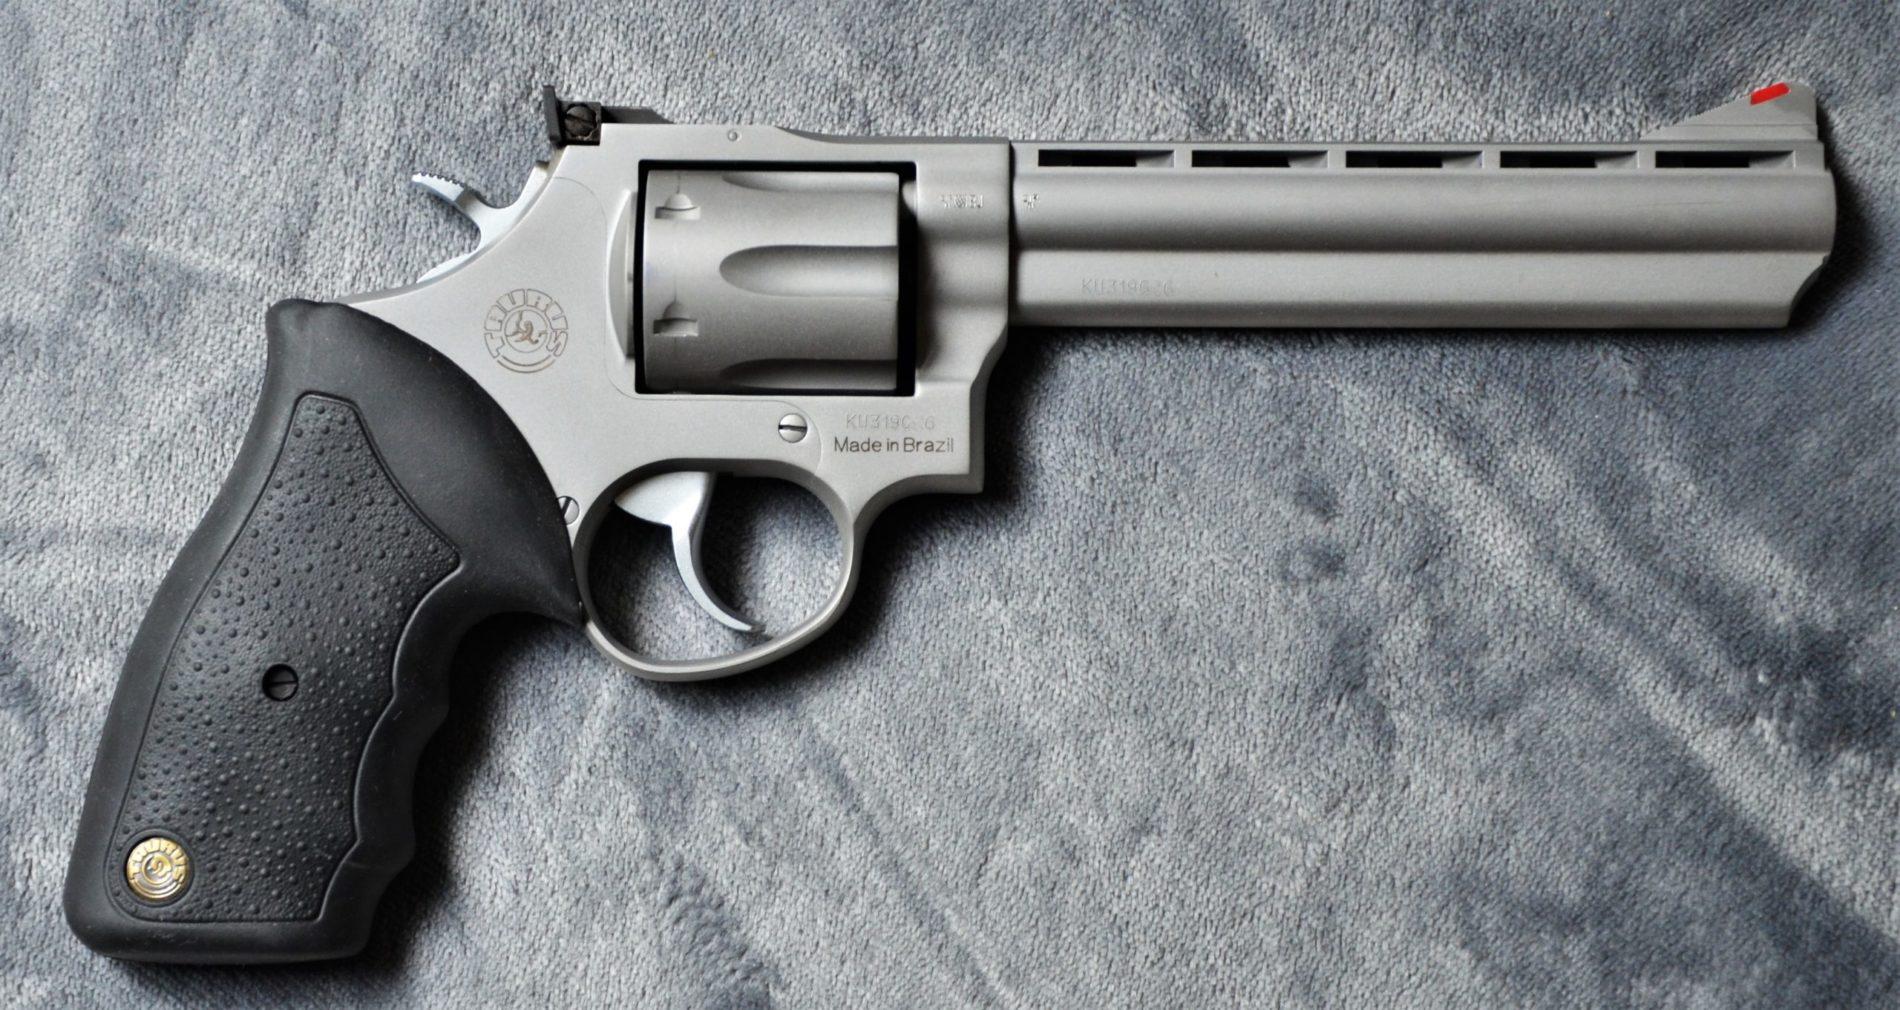 Taurus 689 6'' STS - .357 Mag - Revolver rechts